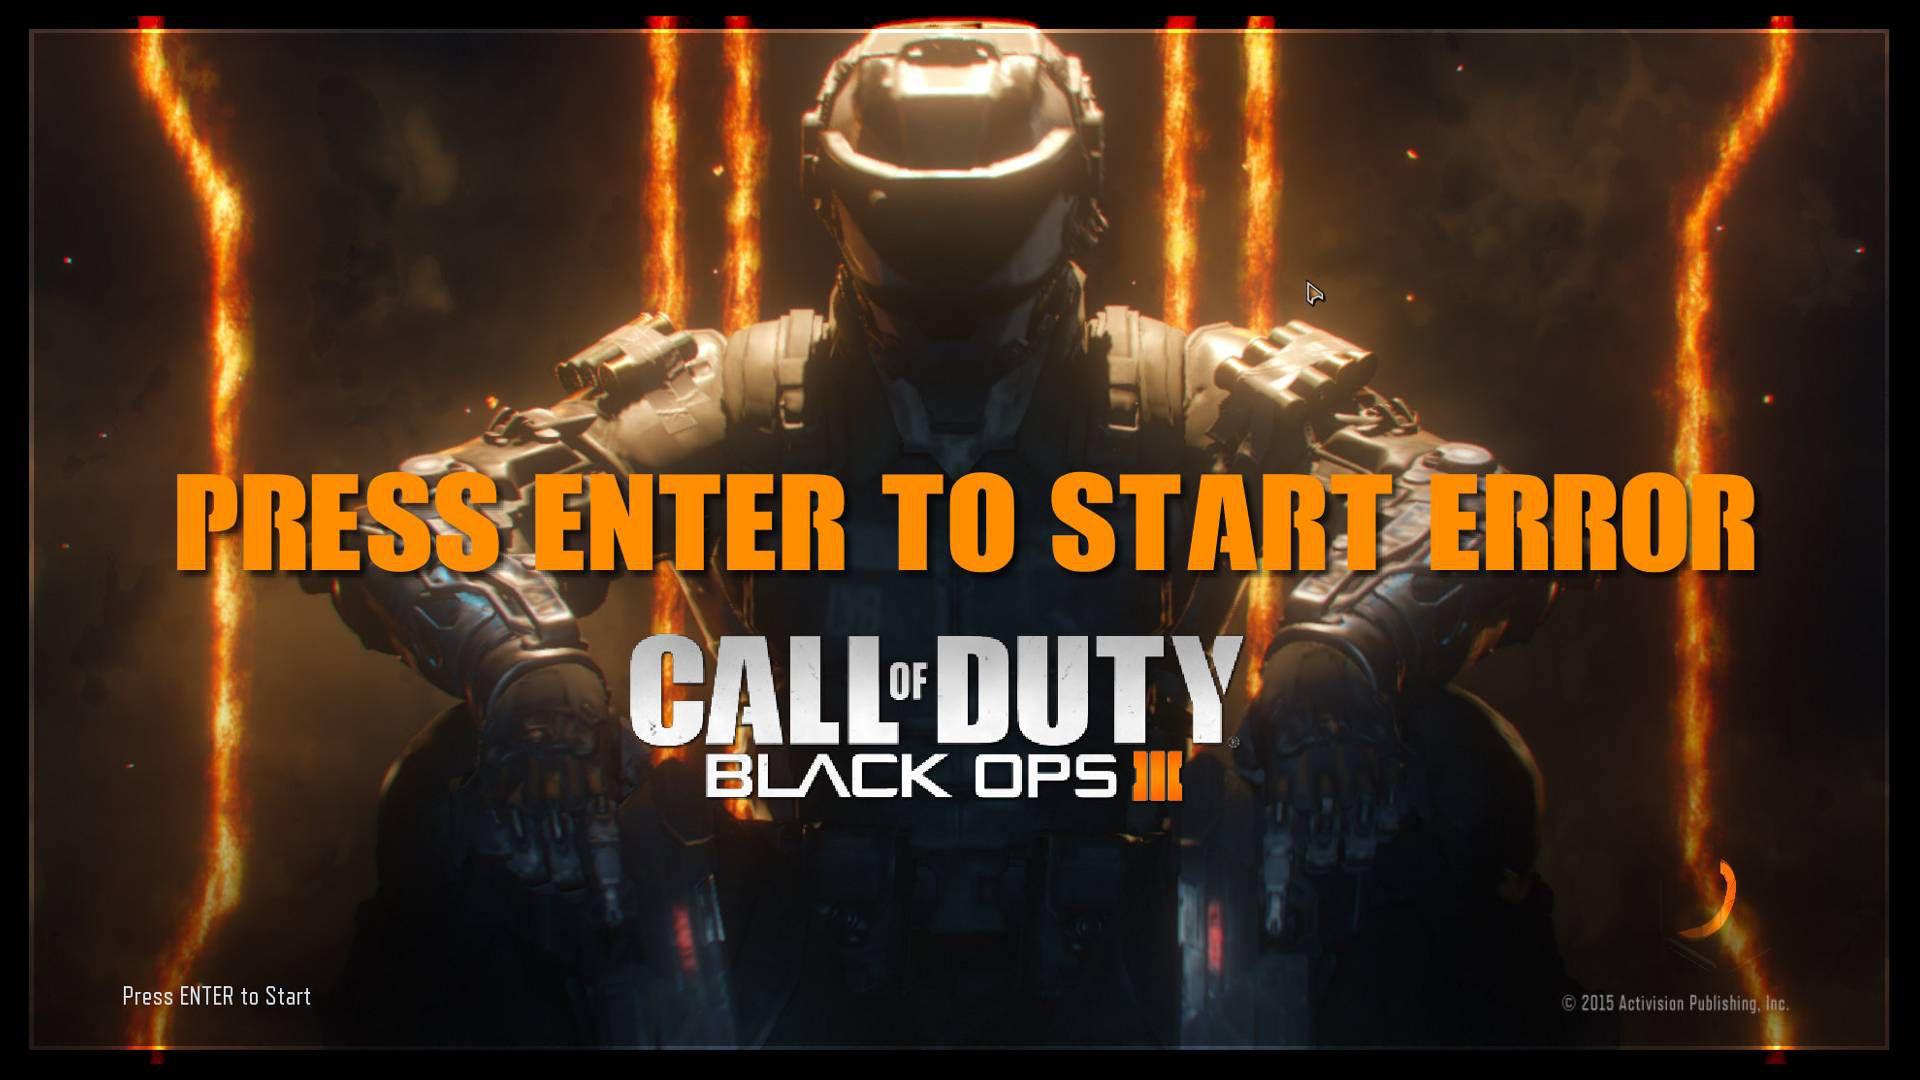 Black Ops 3 Press ENTER to Start Error